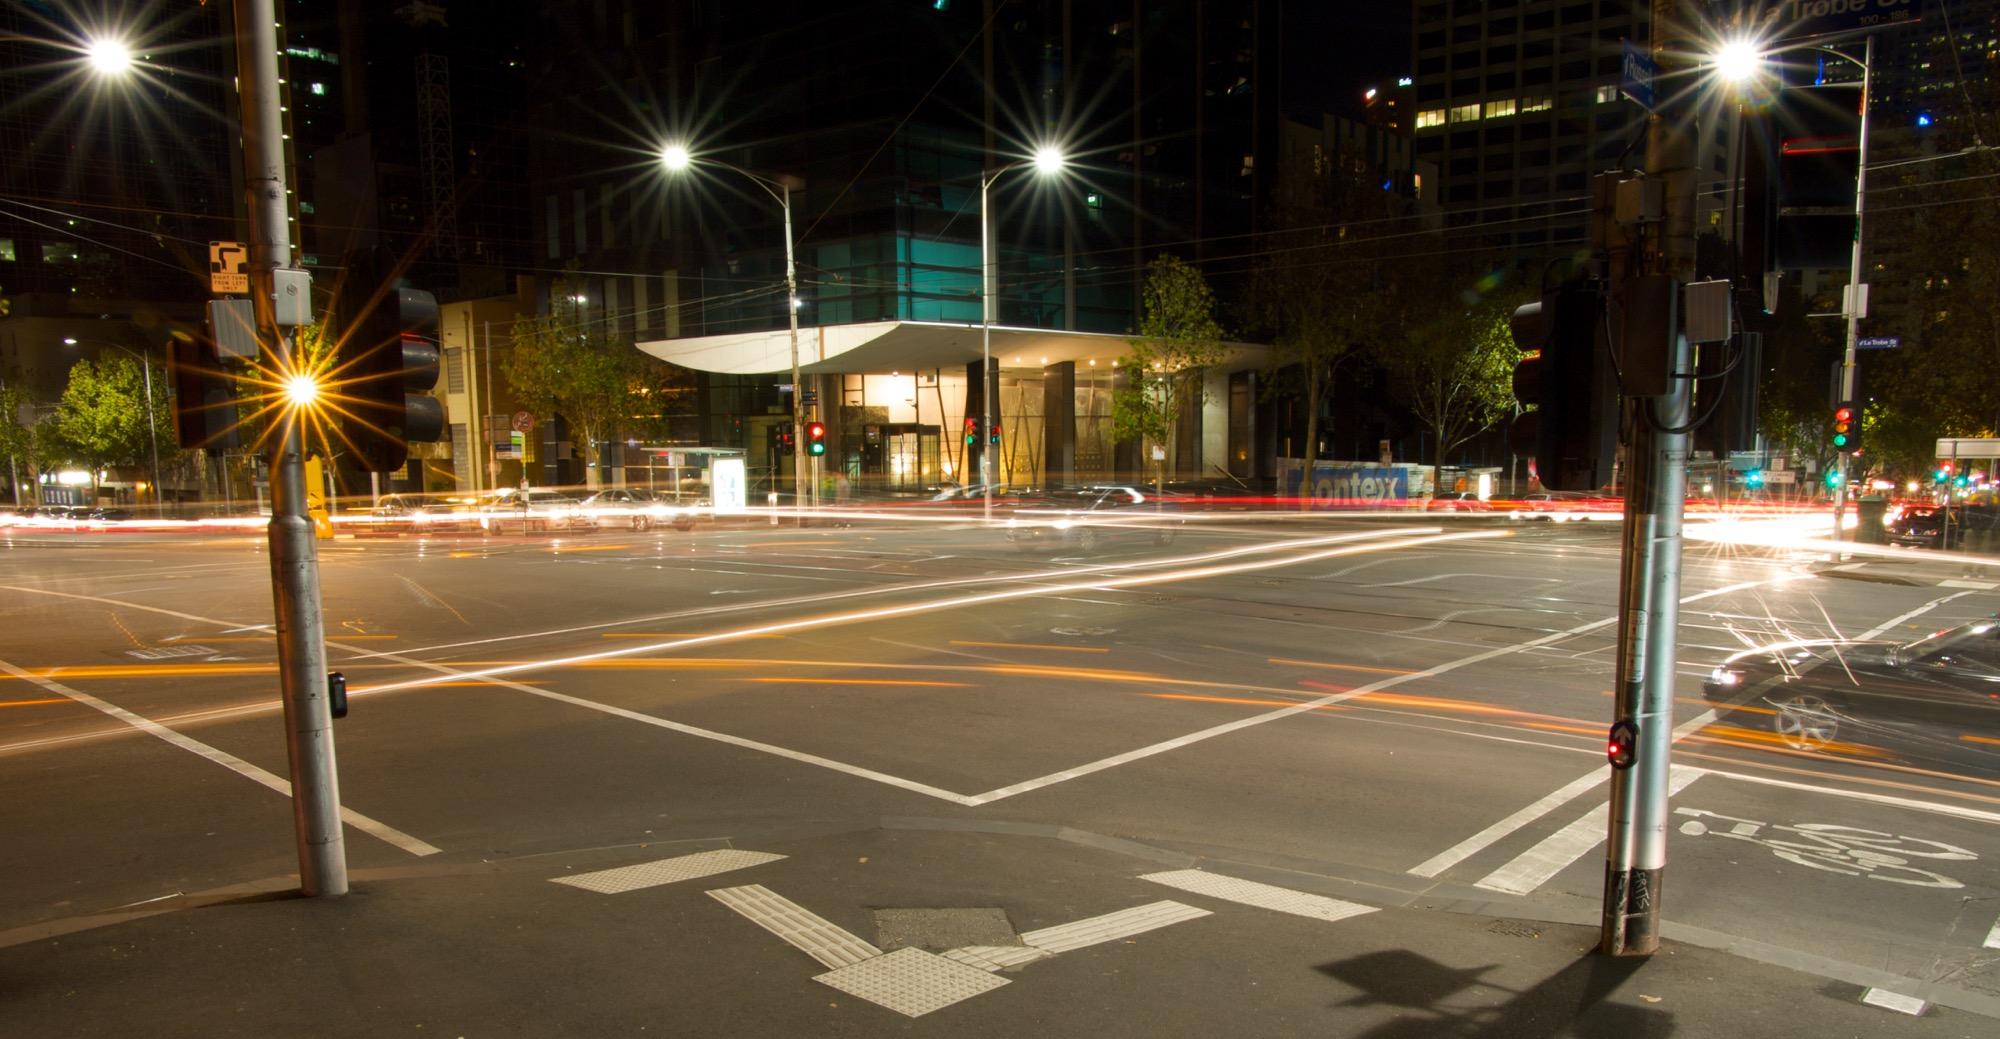 Melbourne stuff - 1 of 223 (124).jpg